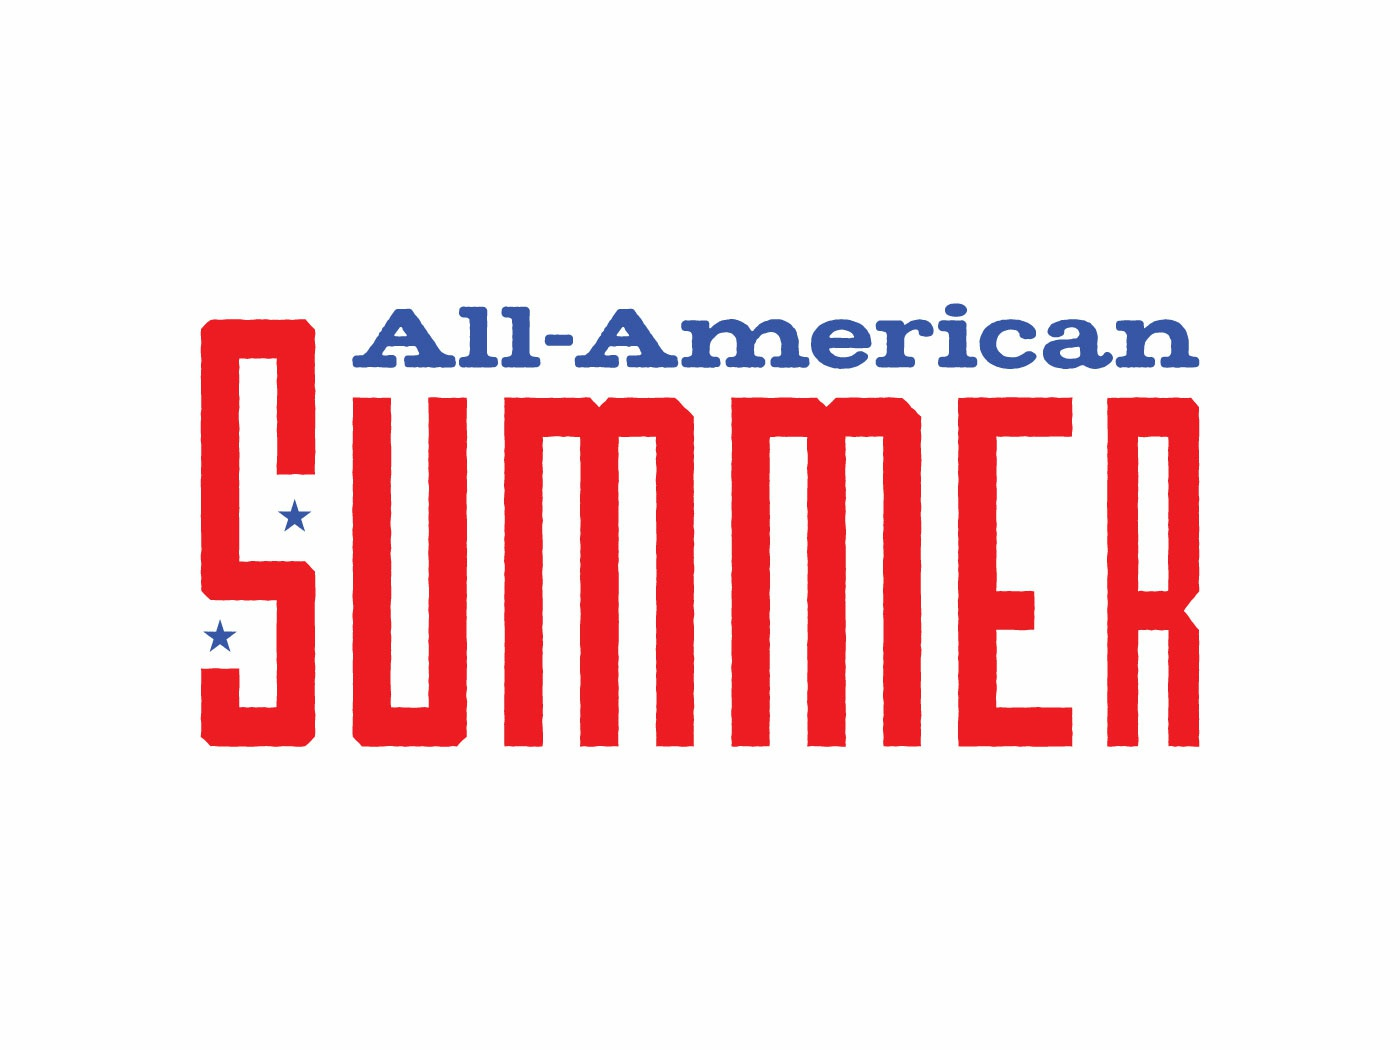 All American Summer homage retro distress vintage stars and stripes stars american america summer wordmark logo wordmark logo usa